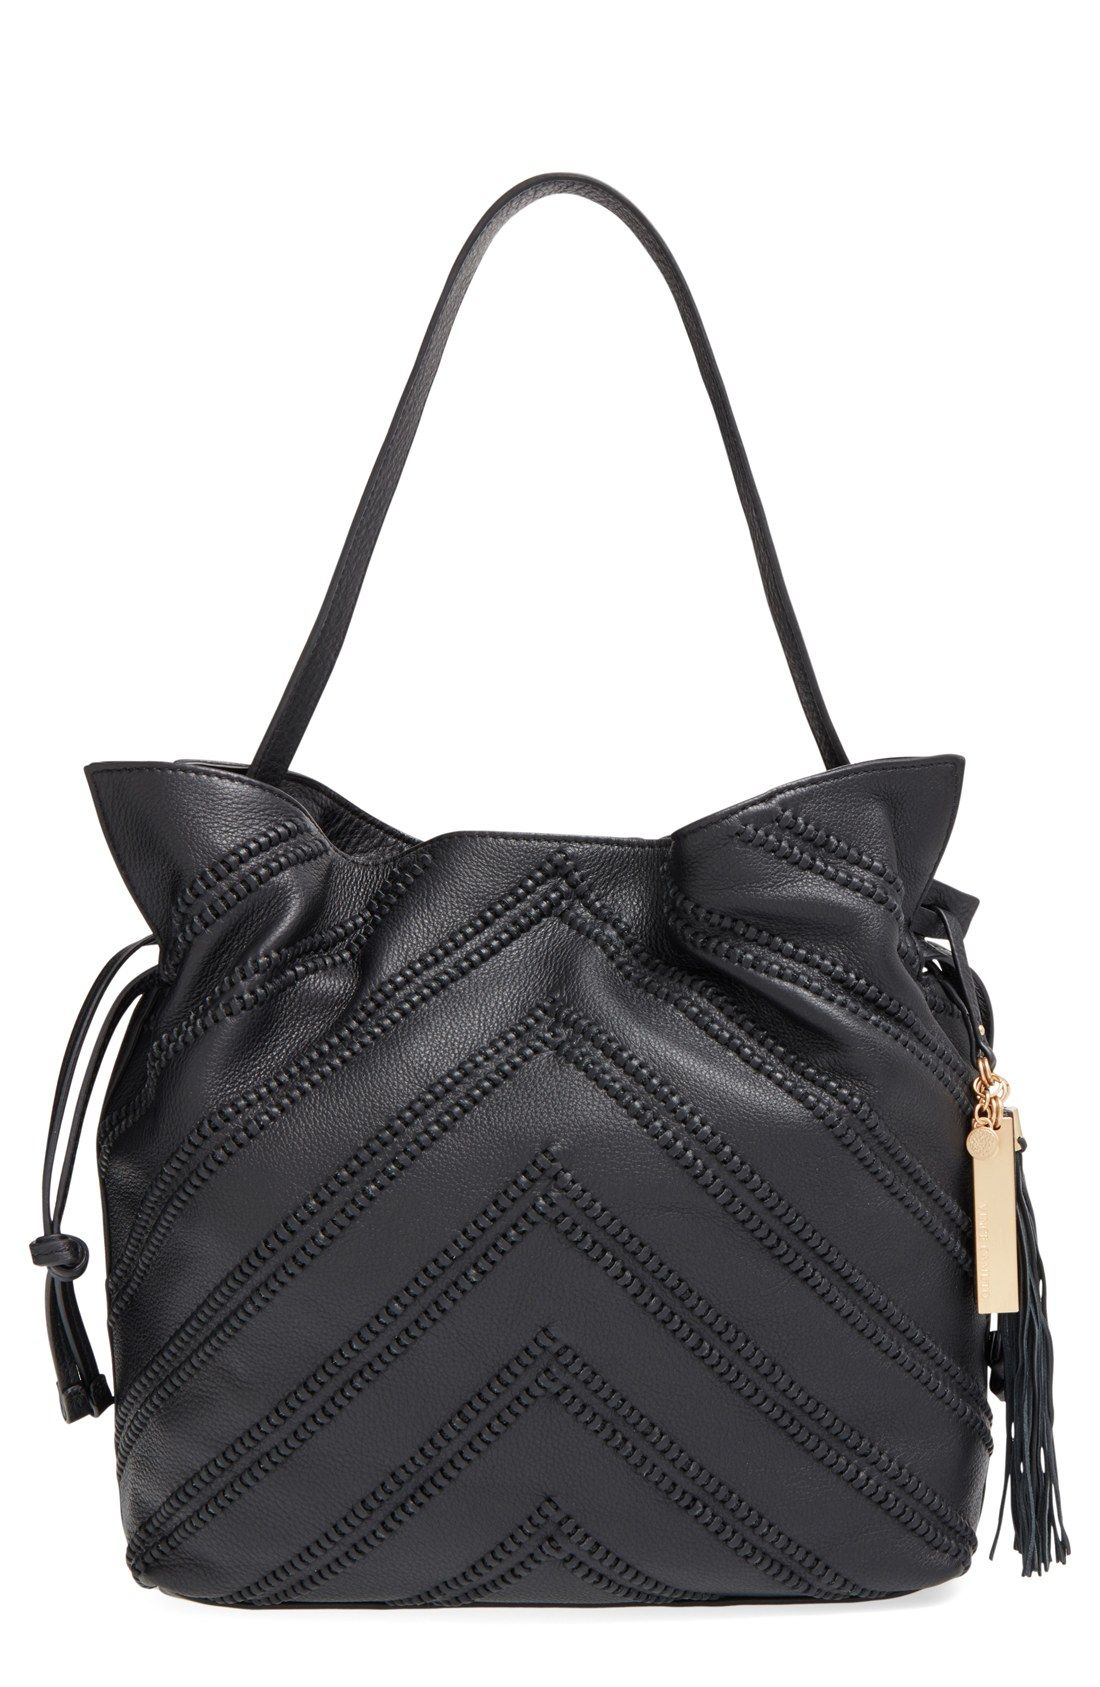 Vince Camuto Nella Leather Hobo Bag